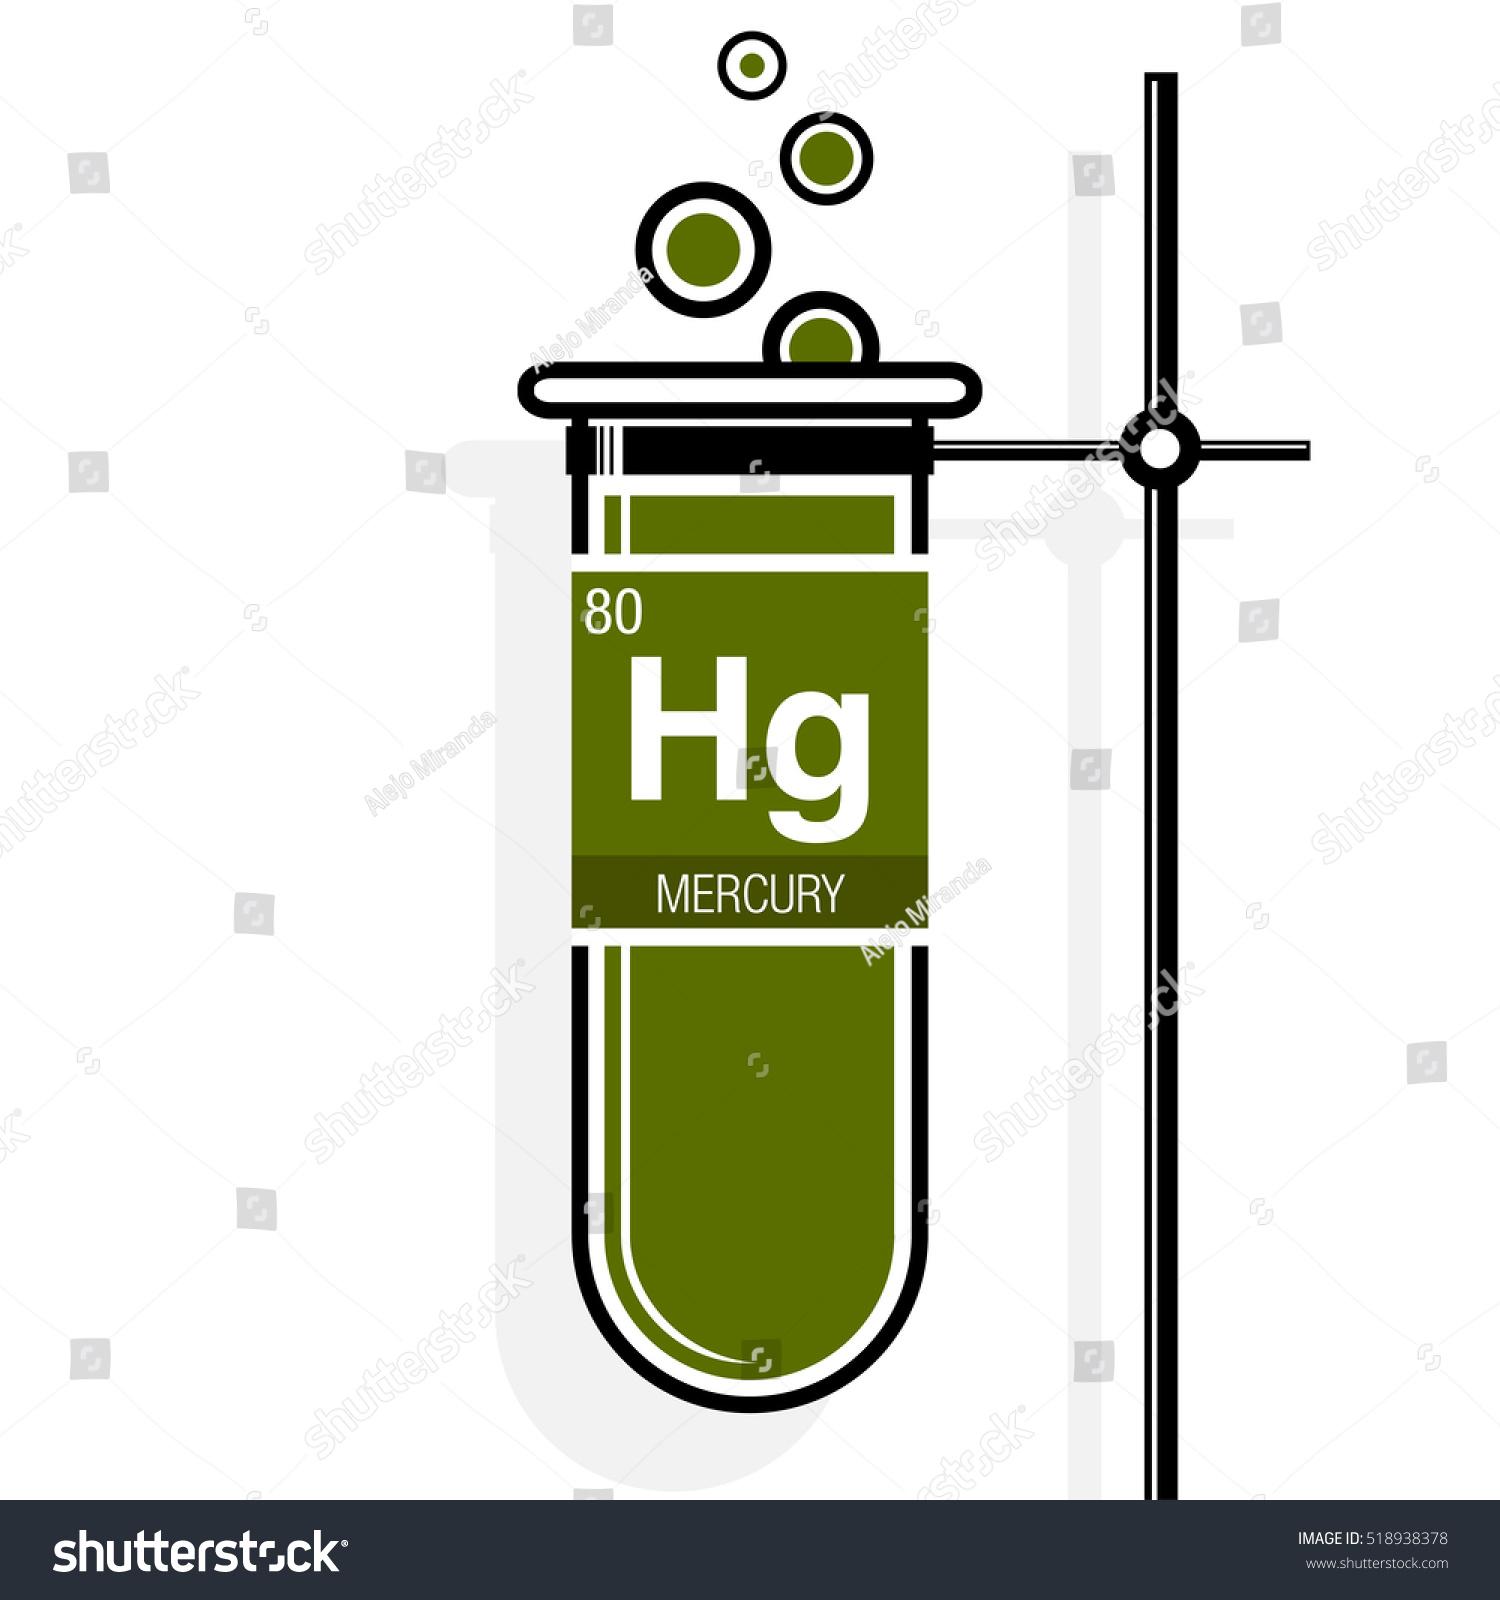 Mercury symbol on periodic table gallery periodic table images mercury symbol on label green test stock vector 518938378 mercury symbol on label in a green gamestrikefo Gallery